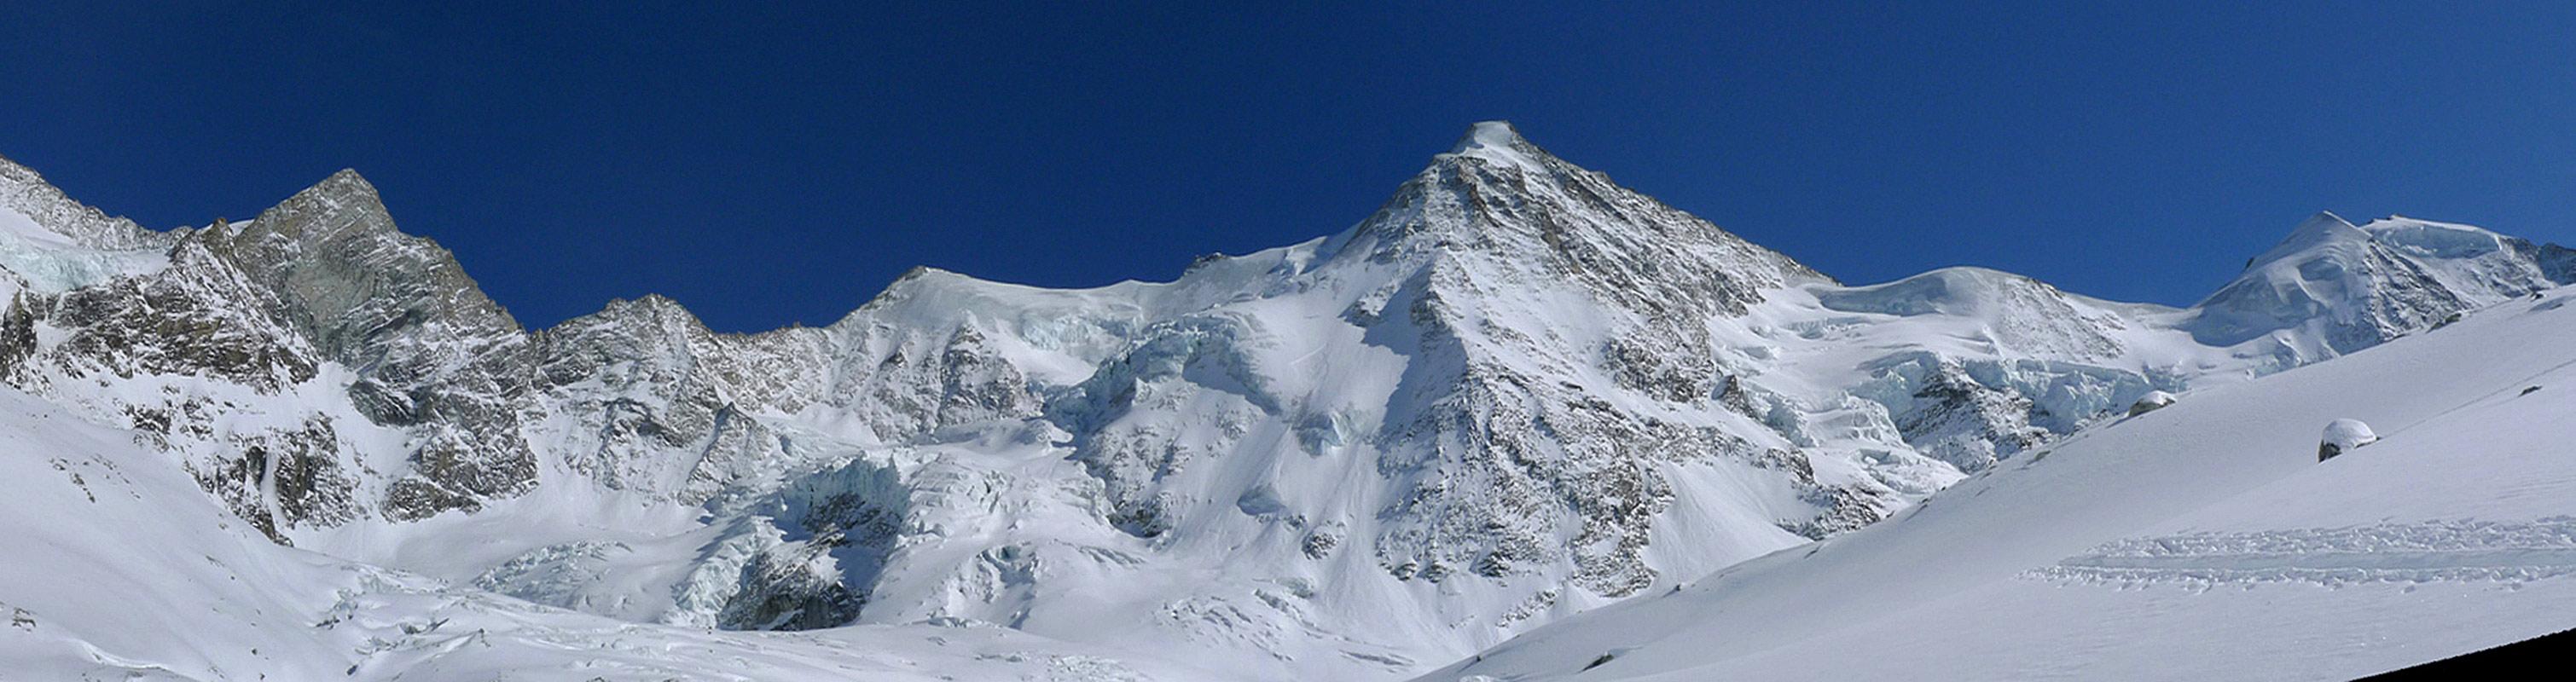 Mont Durand / Arbenhorn Walliser Alpen / Alpes valaisannes Switzerland panorama 39